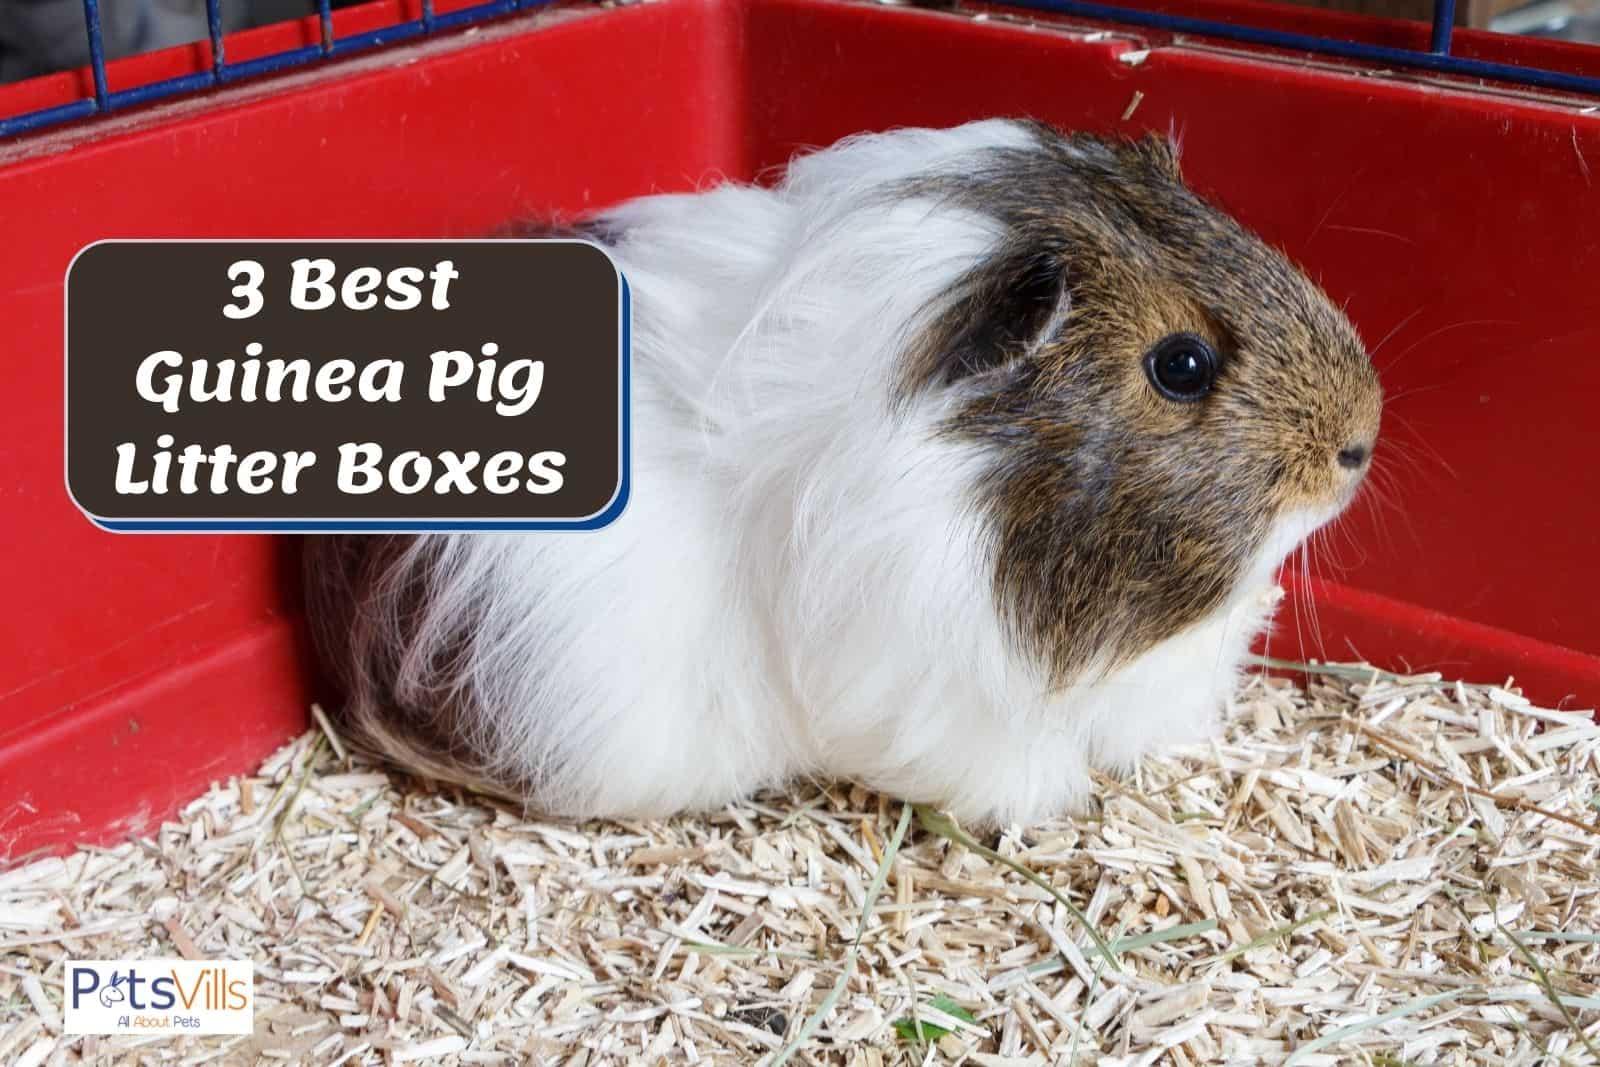 a cute guinea pig sitting on his guinea pig litter box